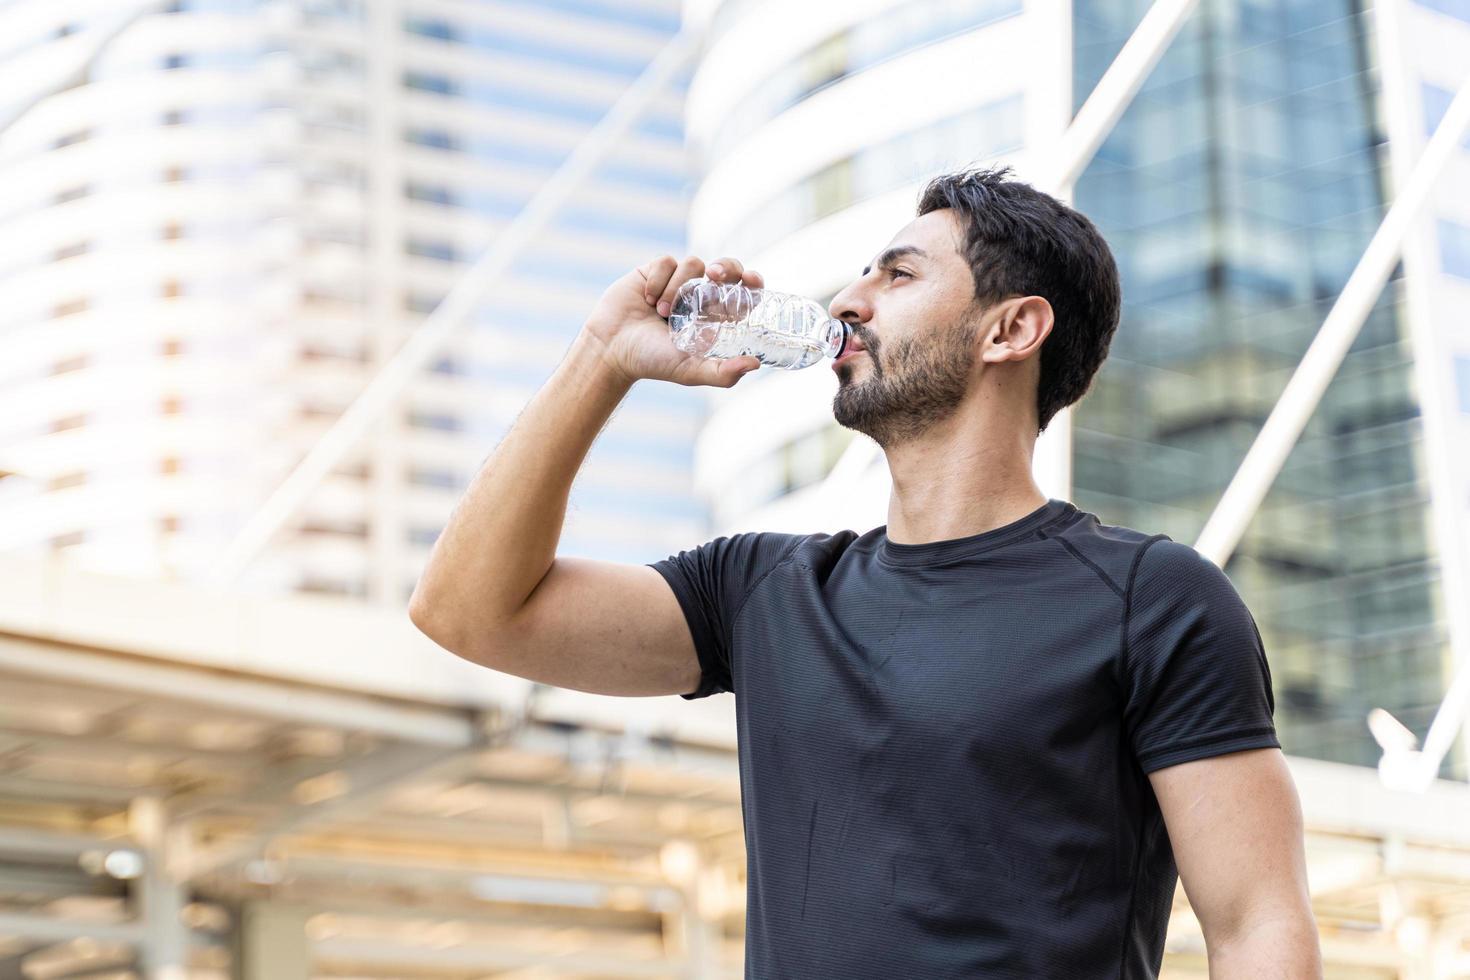 man gebotteld water drinken foto